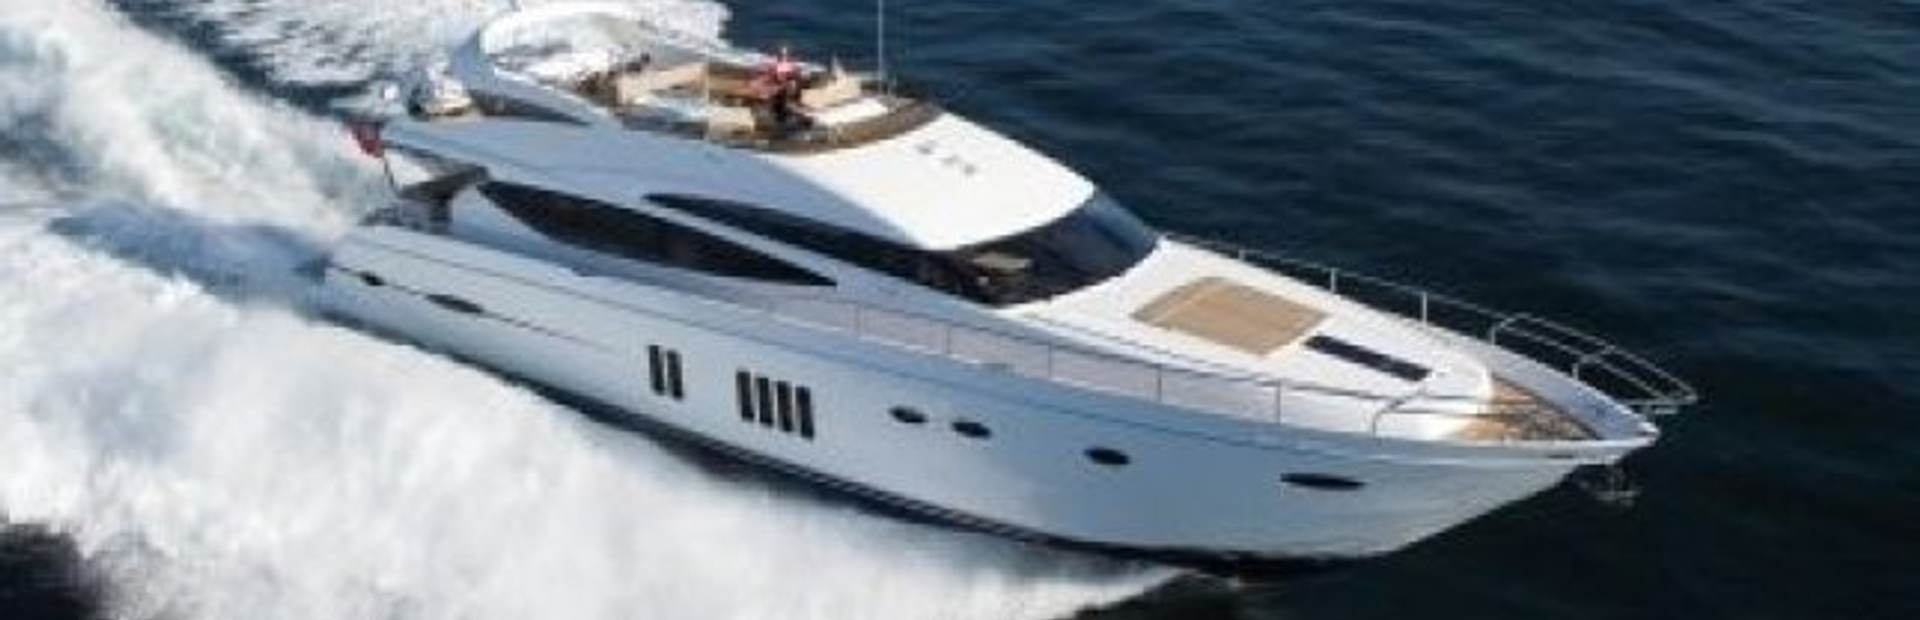 Princess 78 Motor Yacht Yacht Charter